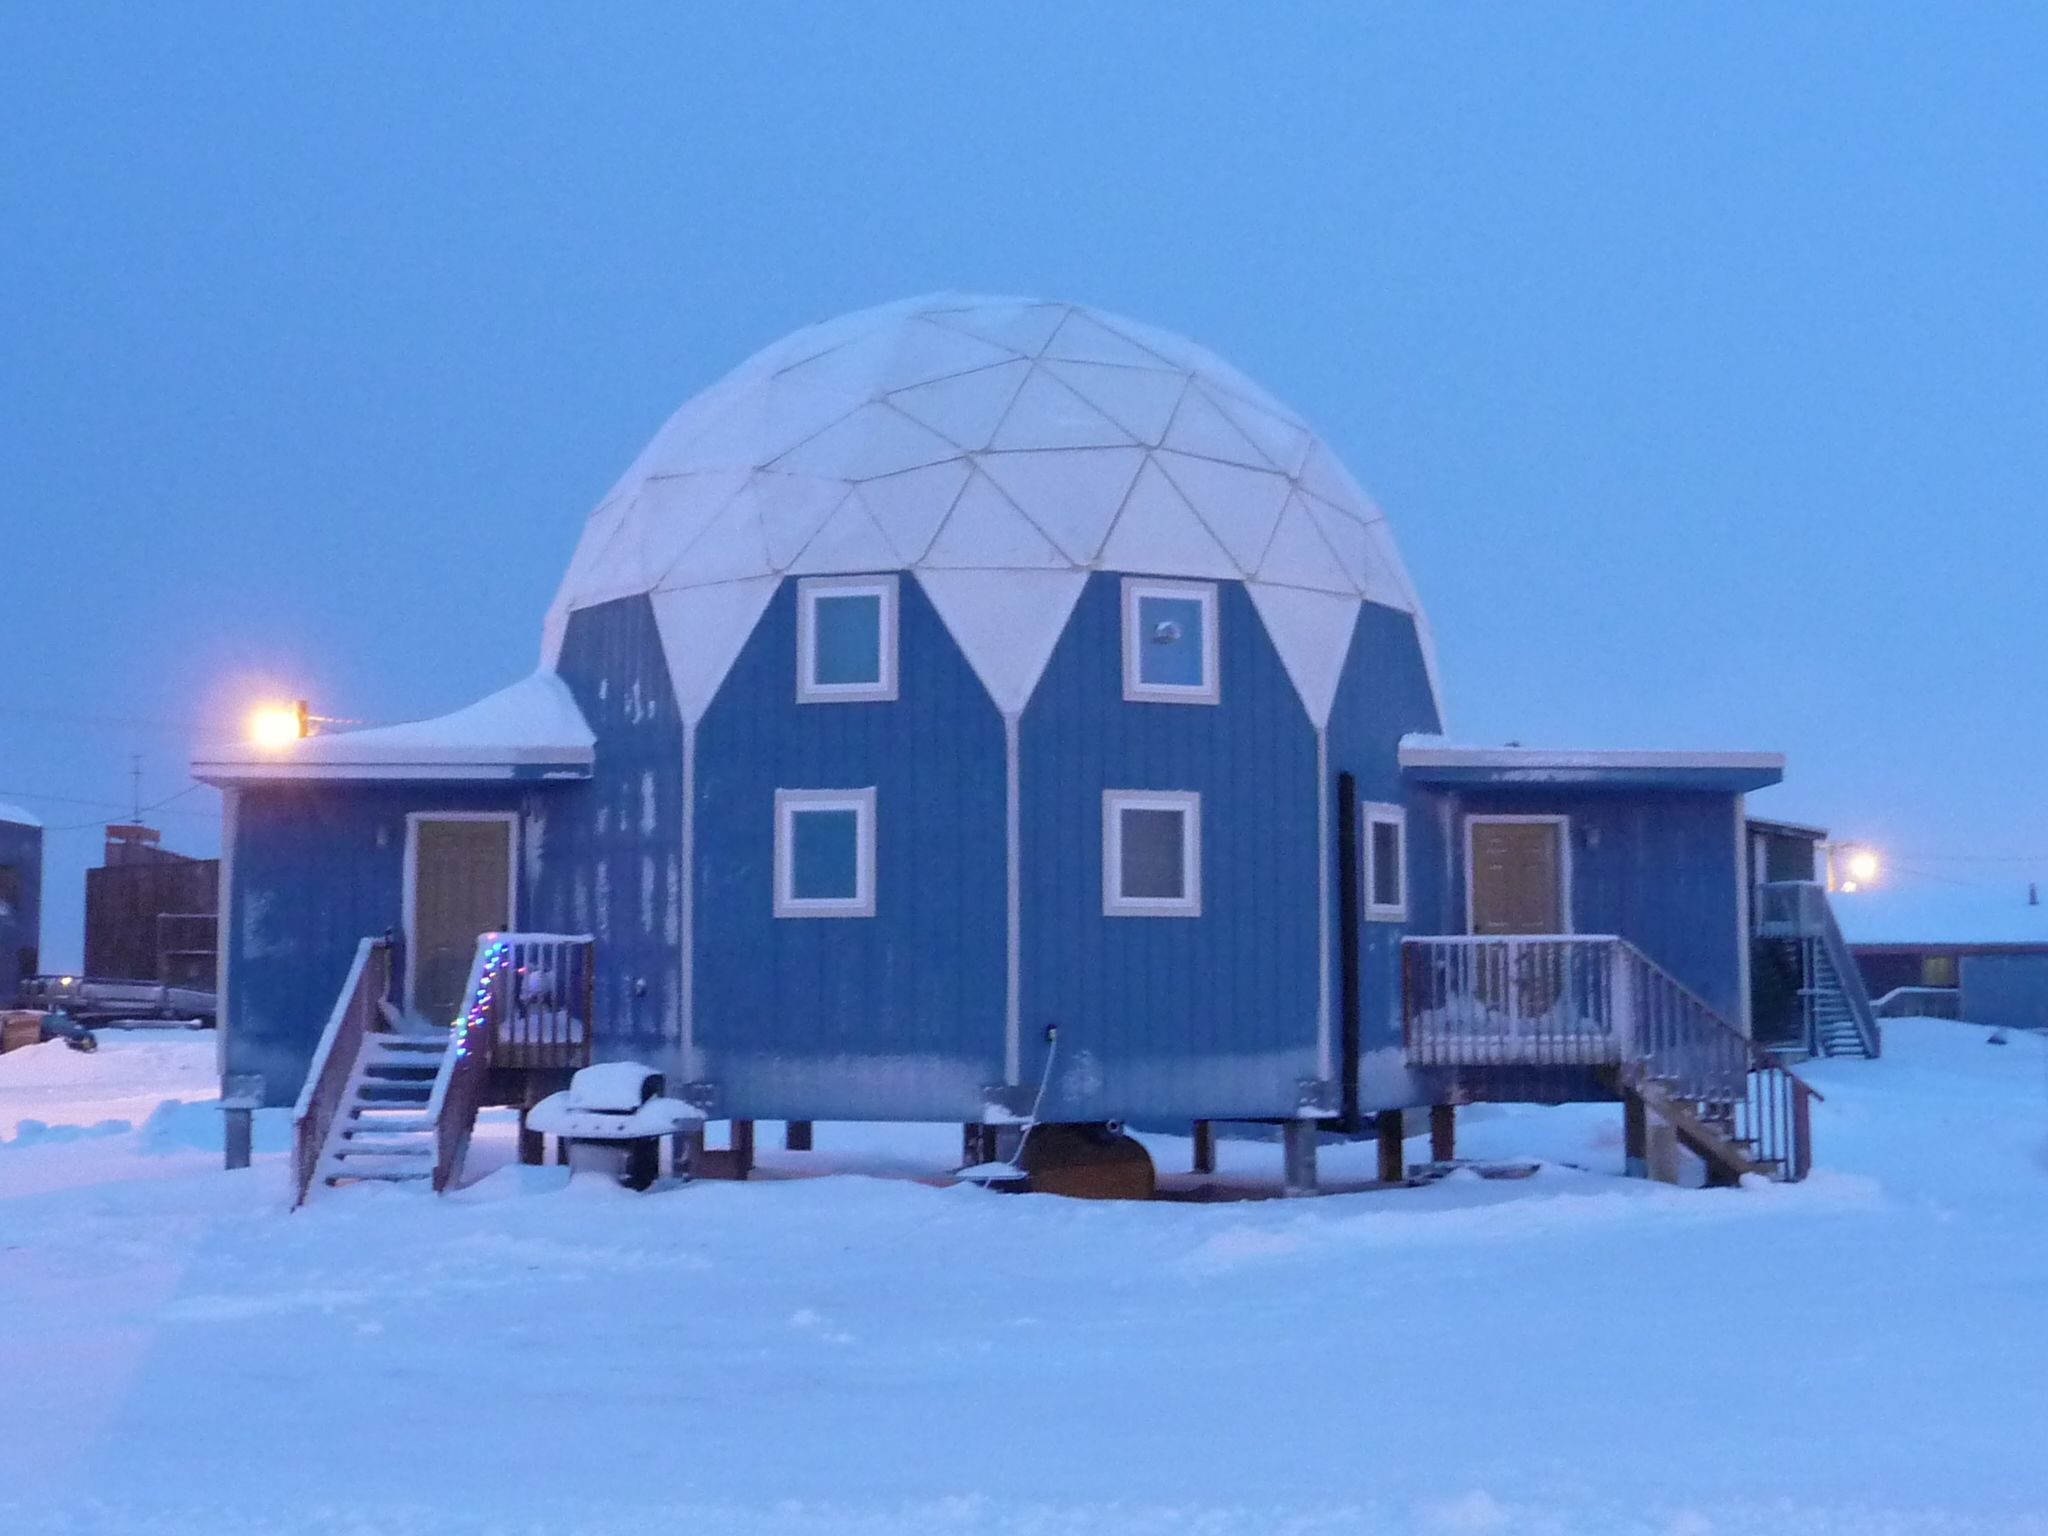 EconOdome Kits 30 ft diameter dome